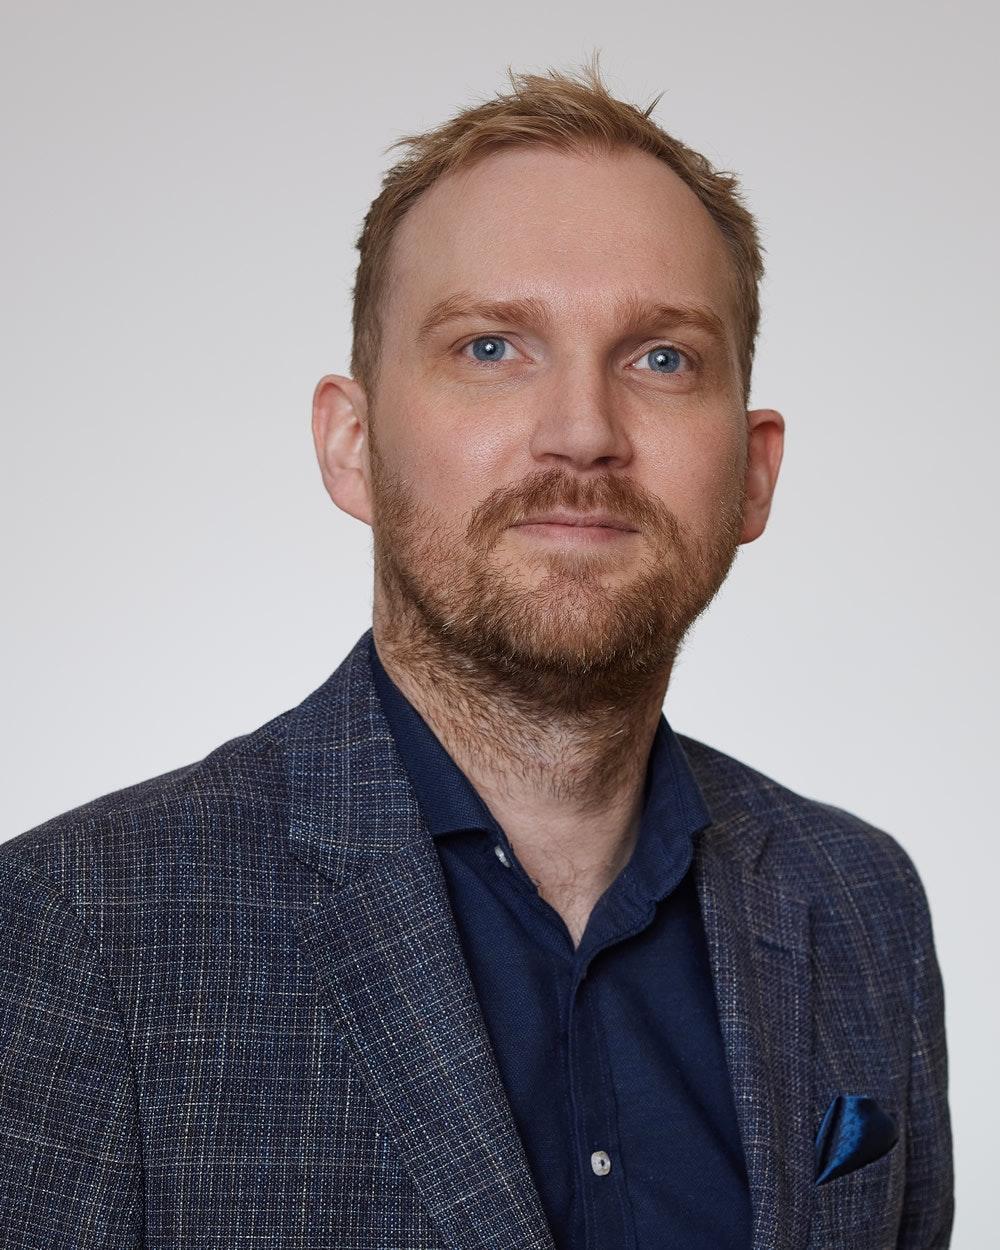 Arnar Magnússon